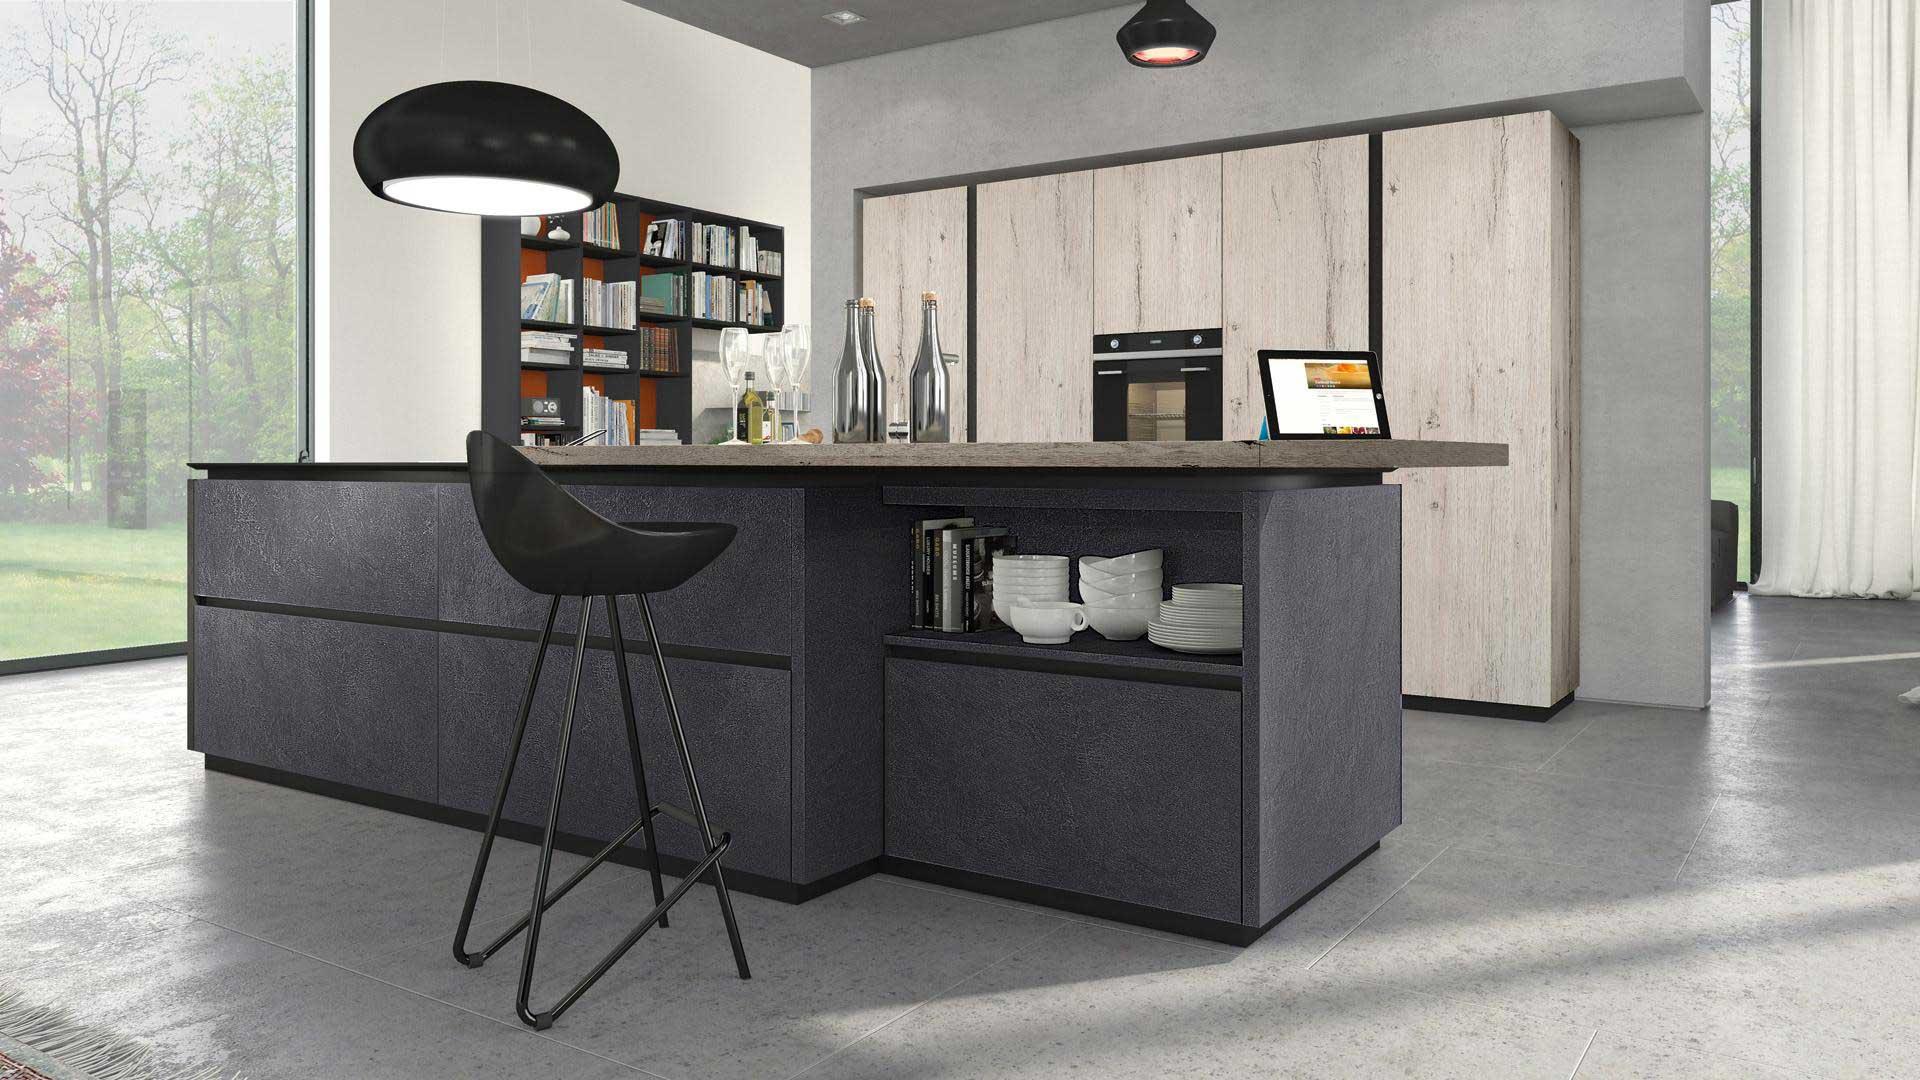 Lube cucina oltre design materico - Tende per cucine moderne ...